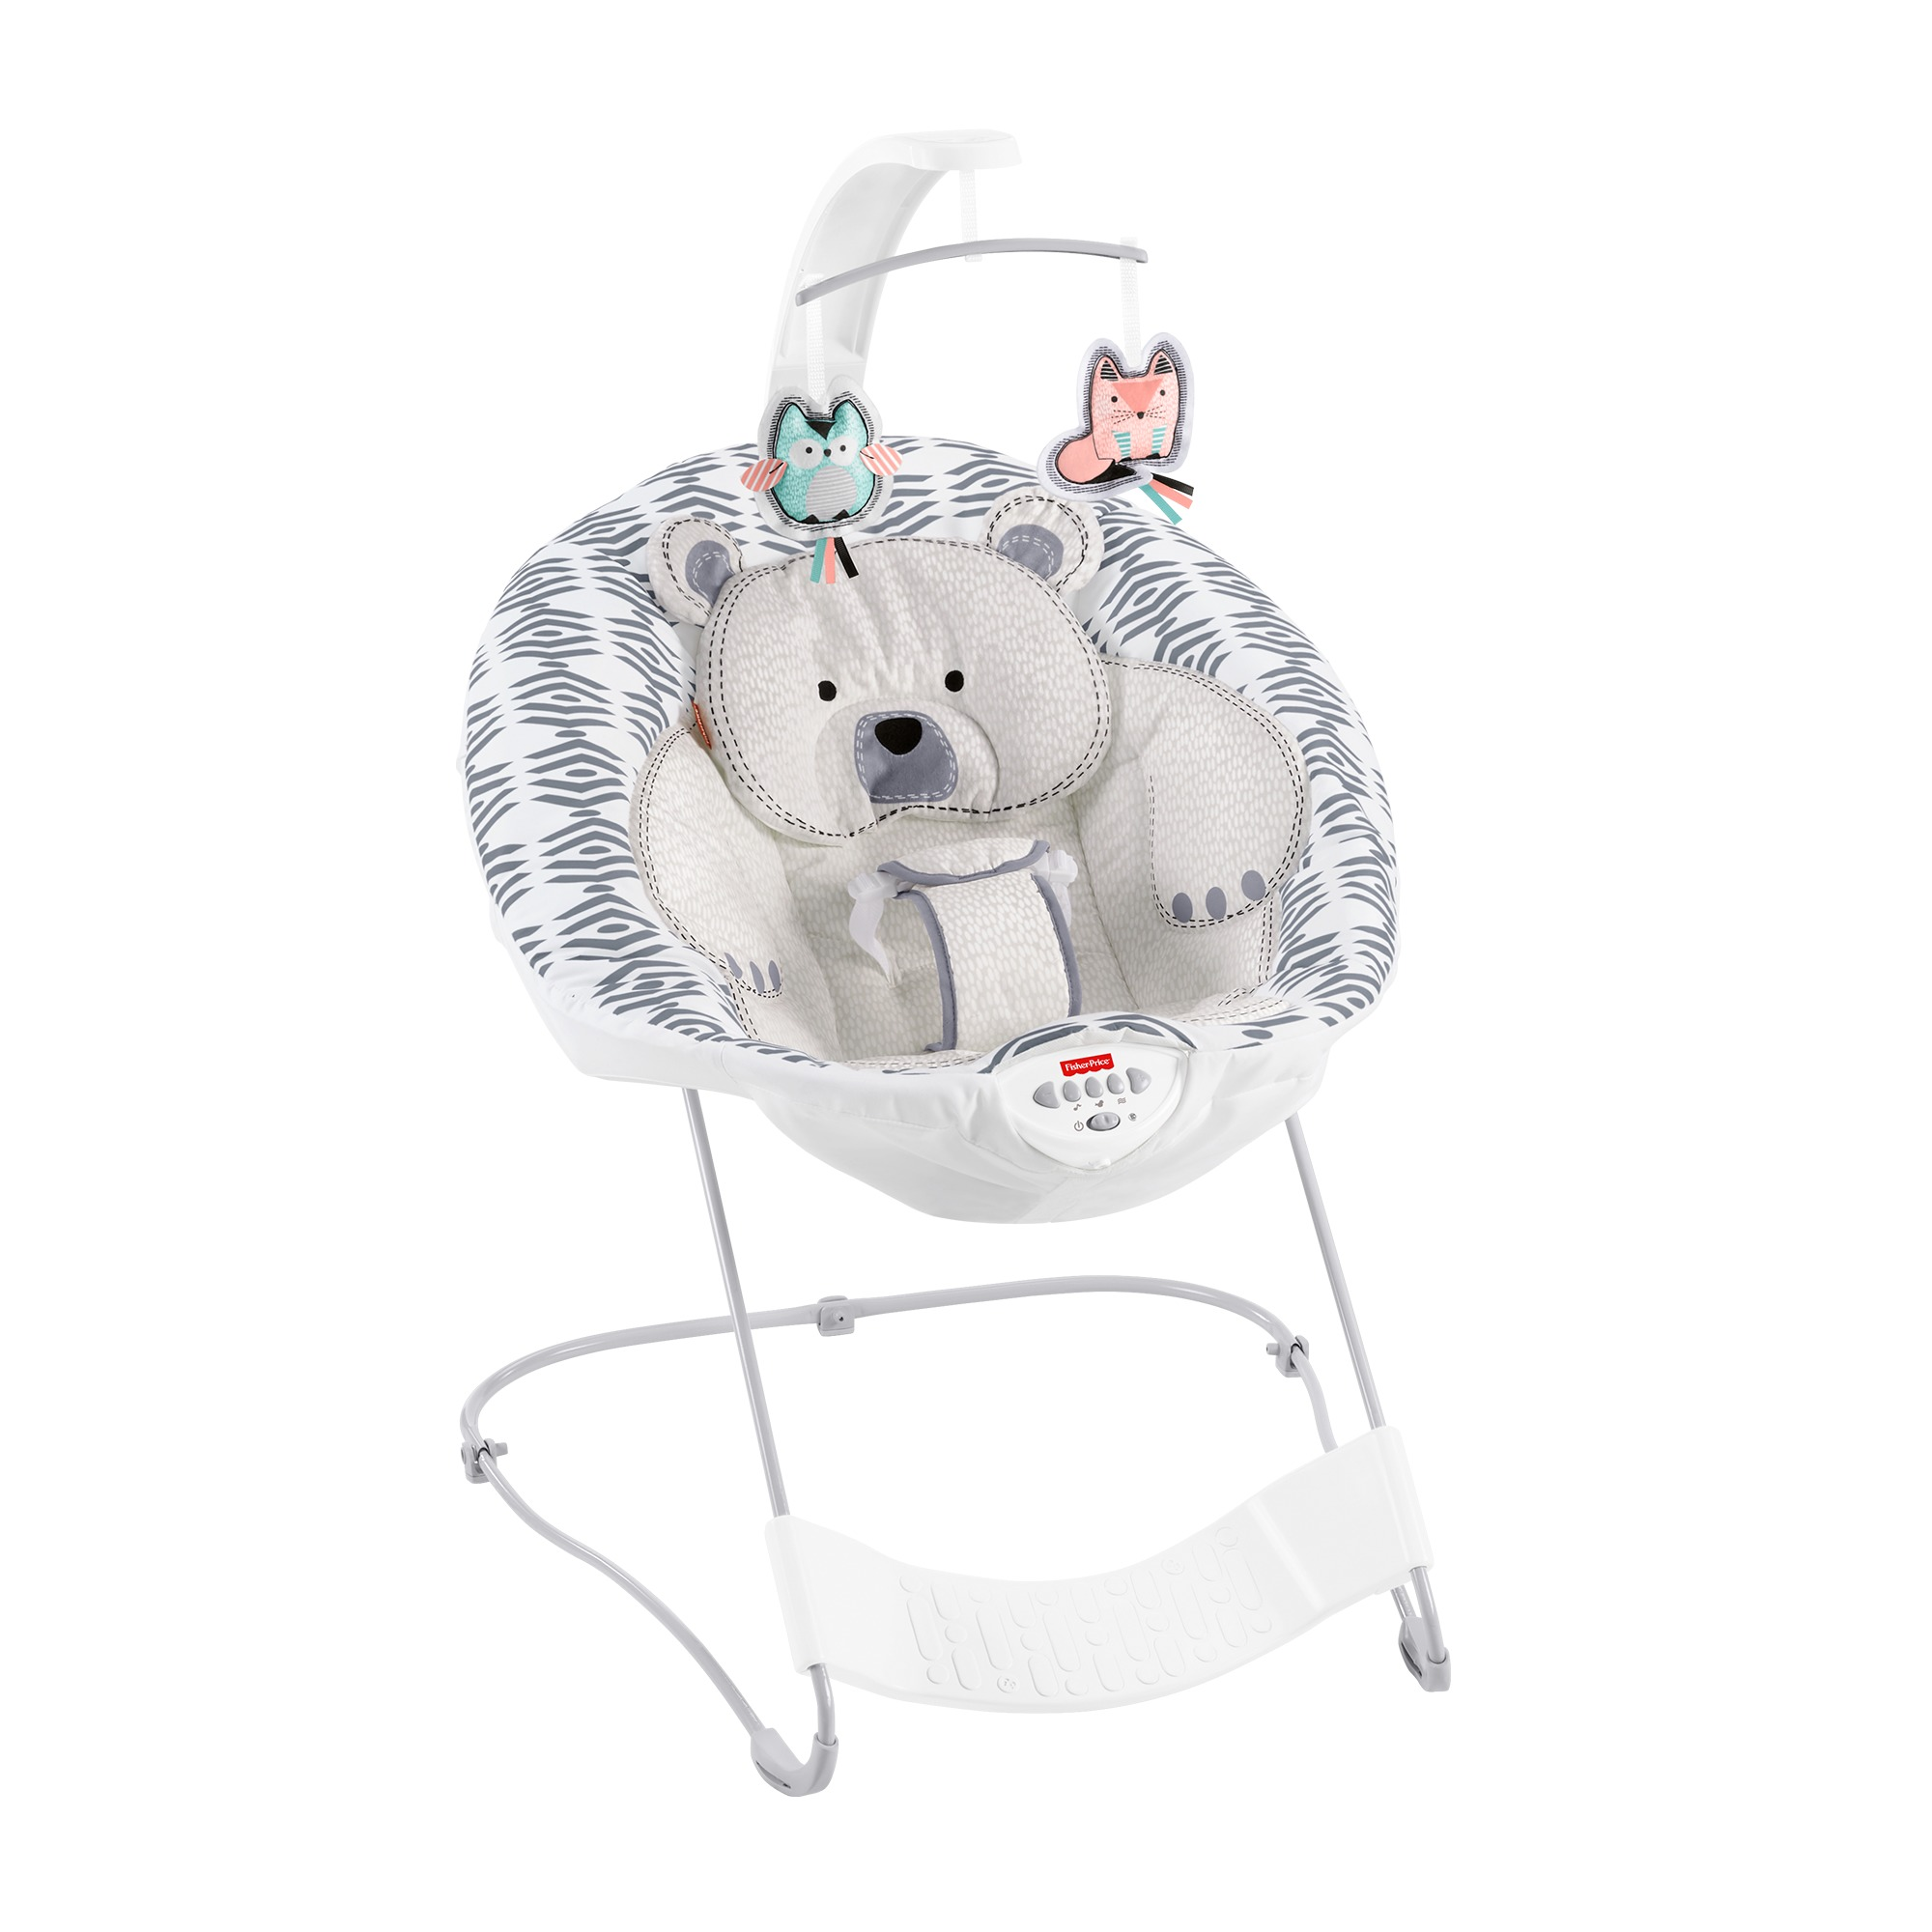 Sockel Pan gro/ße Kinder-WC Baby-WC Babytopf Soft Pad//Hart-Pad Auto Multifunktions-WC BABIFIS Kinder-WC